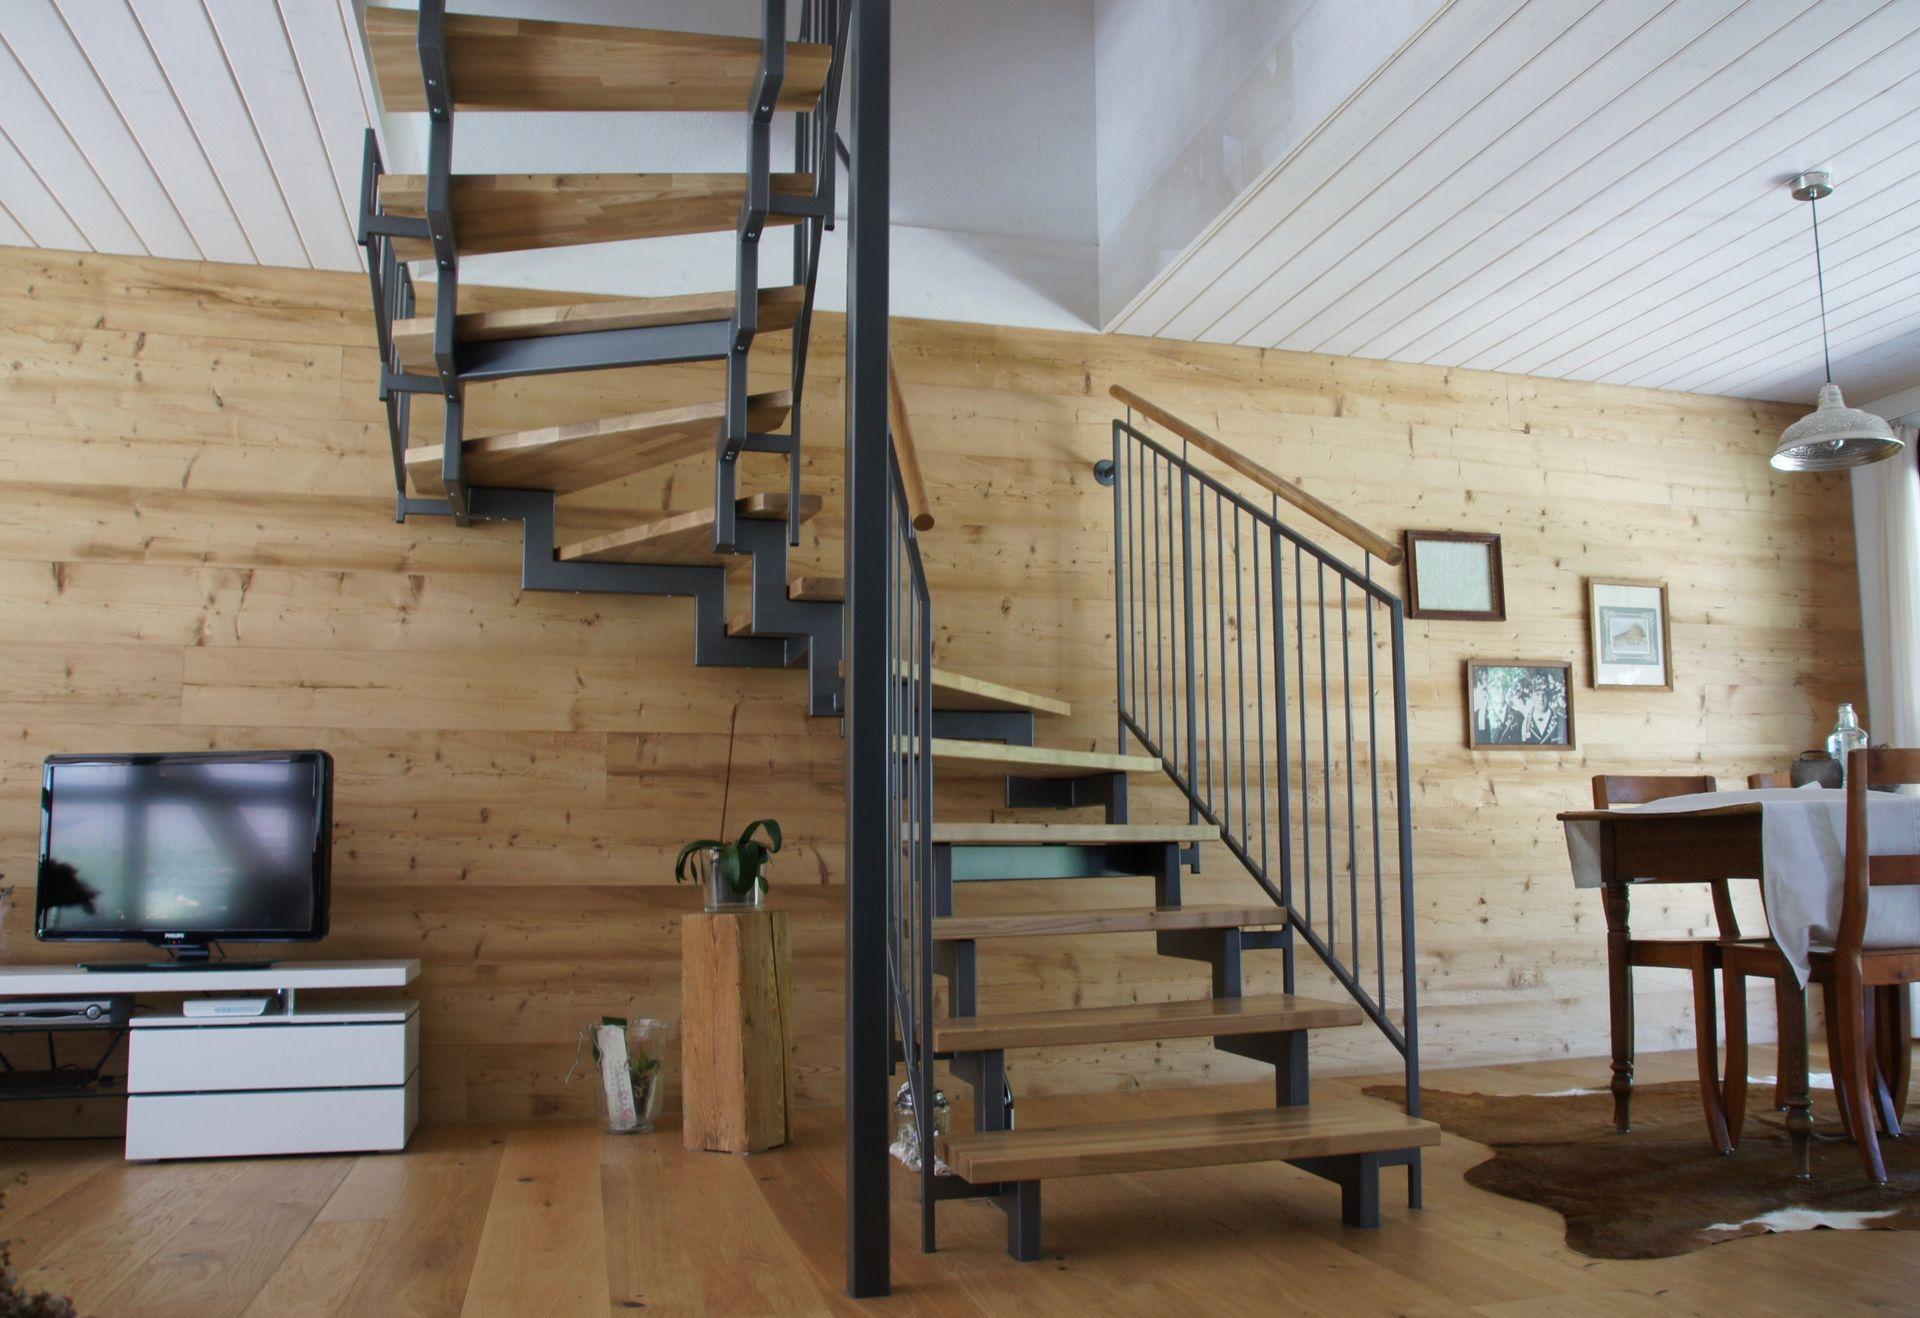 wohnhaustreppen aus holz und stahl ais. Black Bedroom Furniture Sets. Home Design Ideas